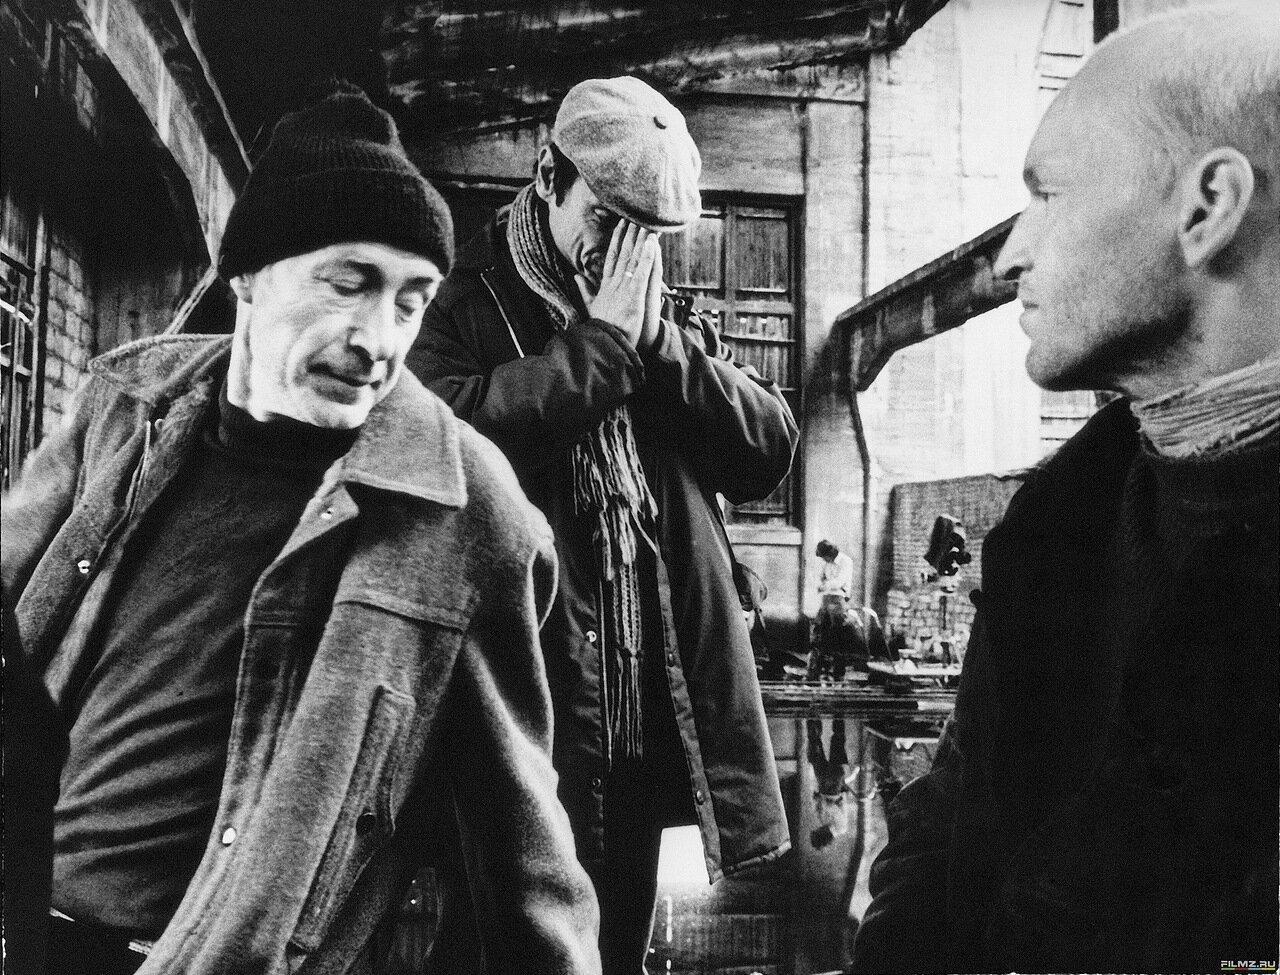 1979. Александр Кайдановский, Николай Гринько, Андрей Тарковский на съемках «Сталкера»